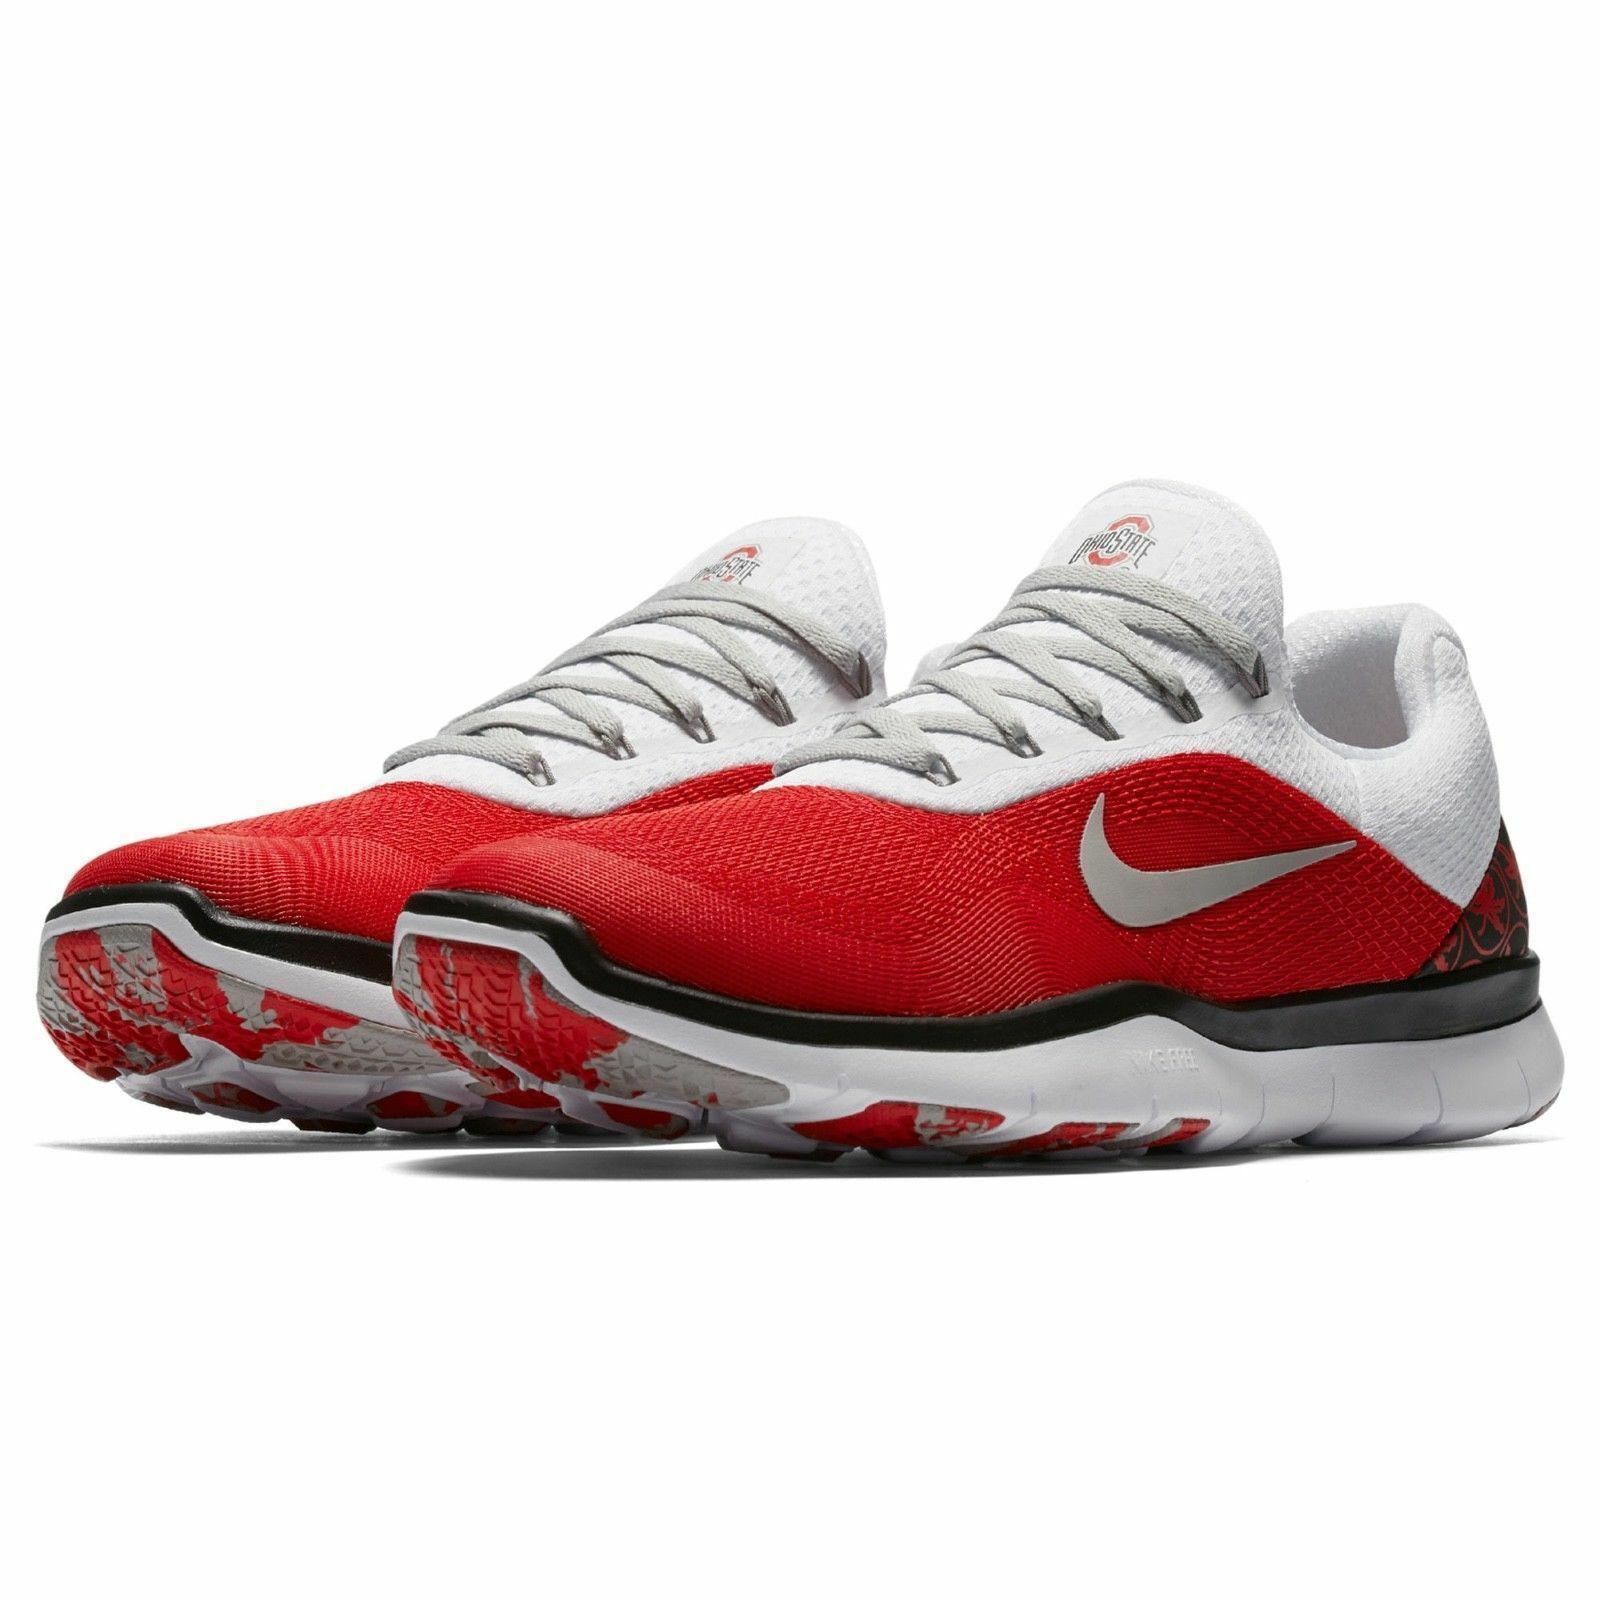 Nike Free Trainer V7 Week Zero size 12.5.Ohio State Buckeyes. OSU. AA0881-605.